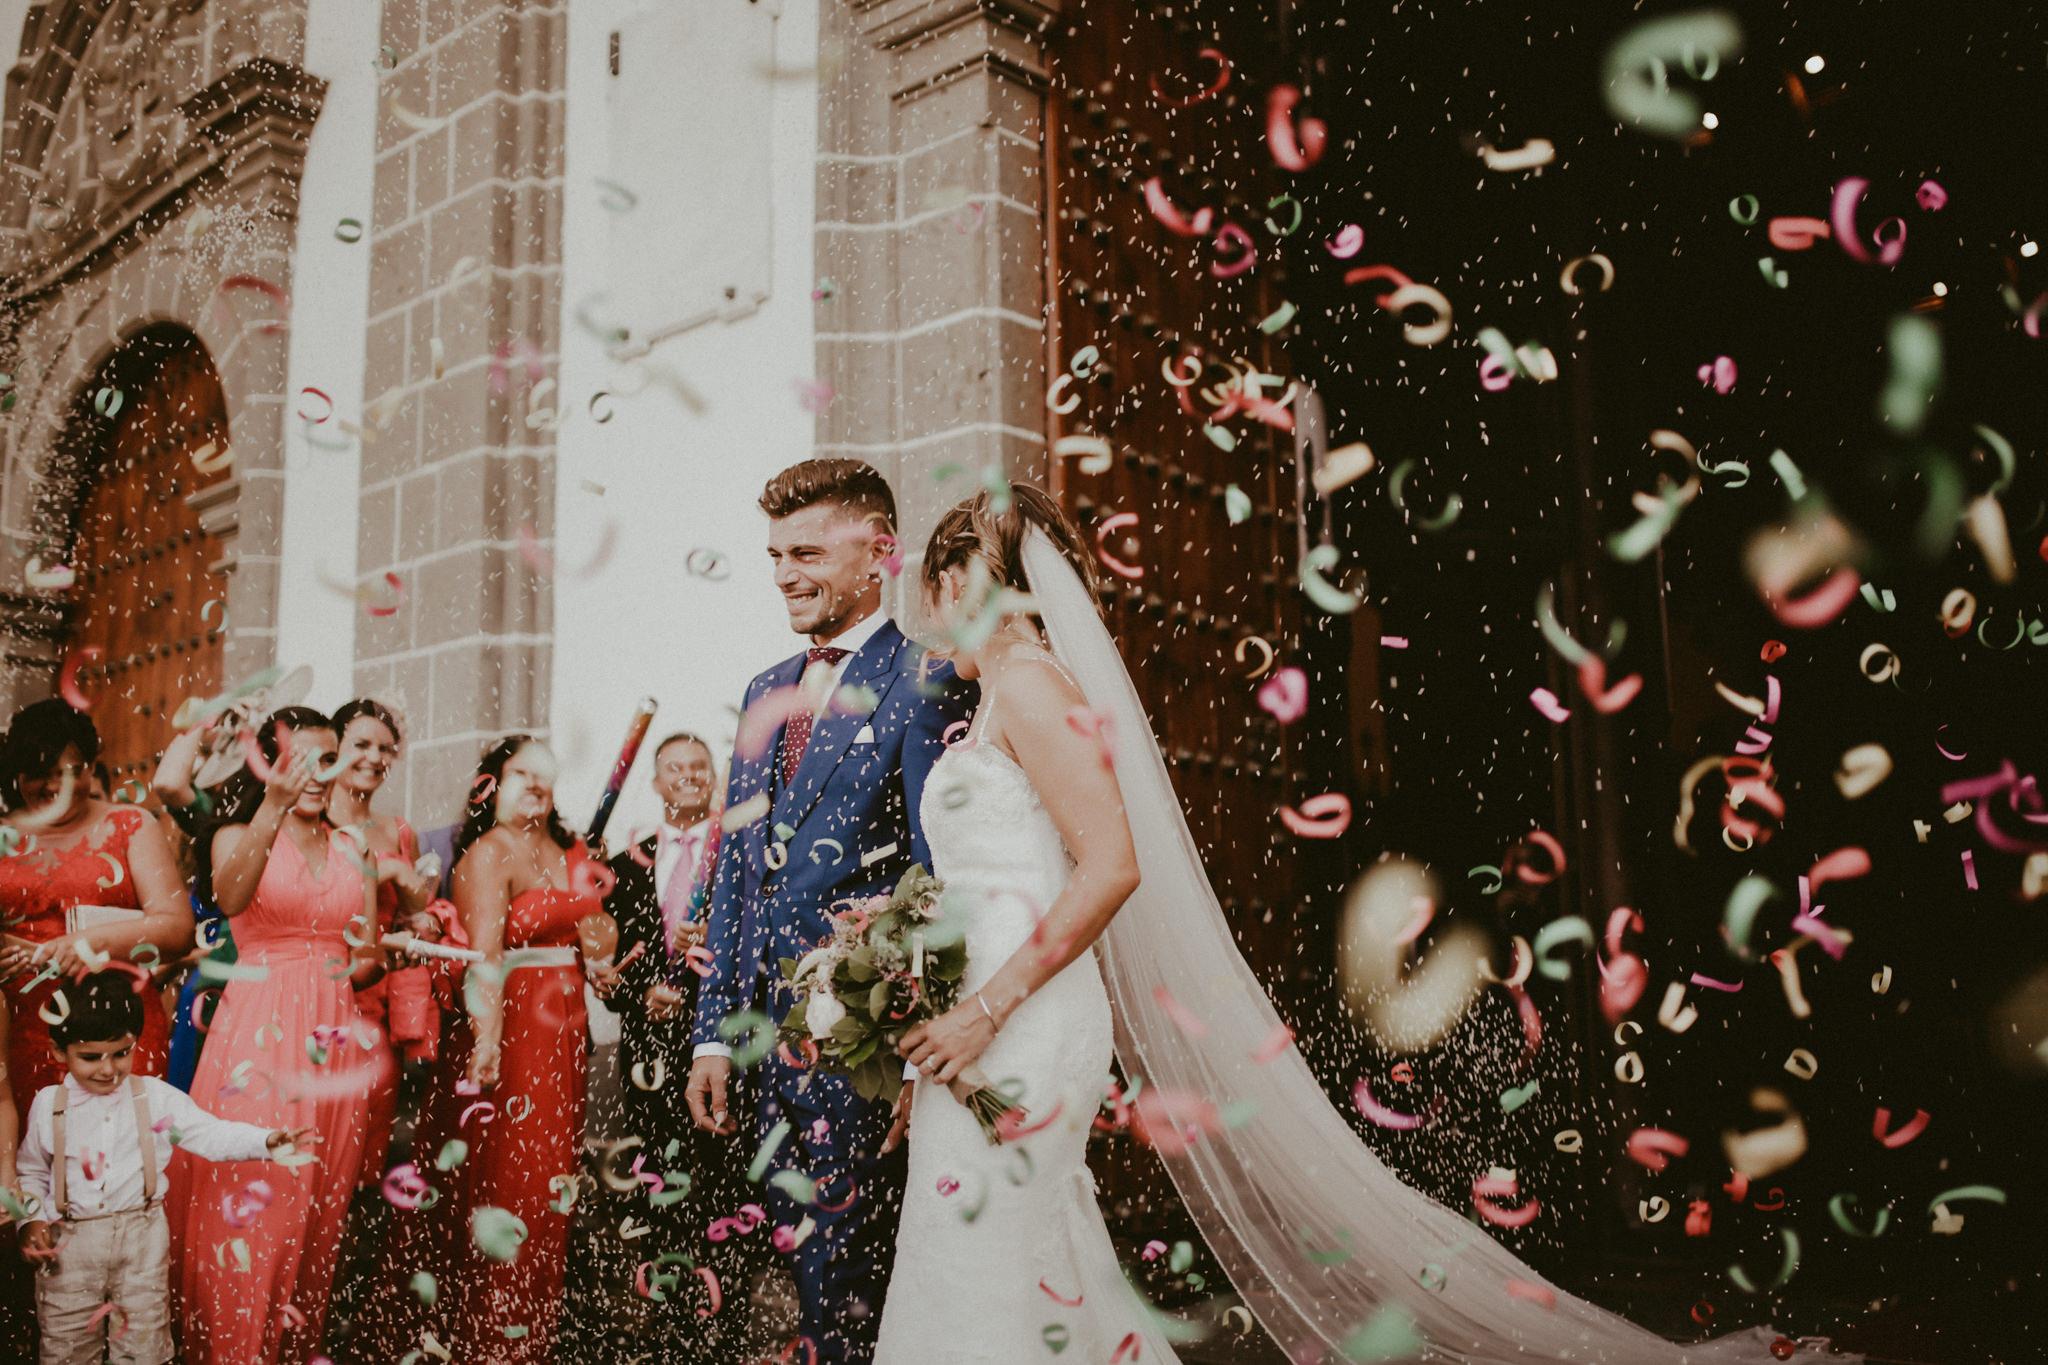 boda-diferente-fotografo-boda-laspalmas-grancanaria-45